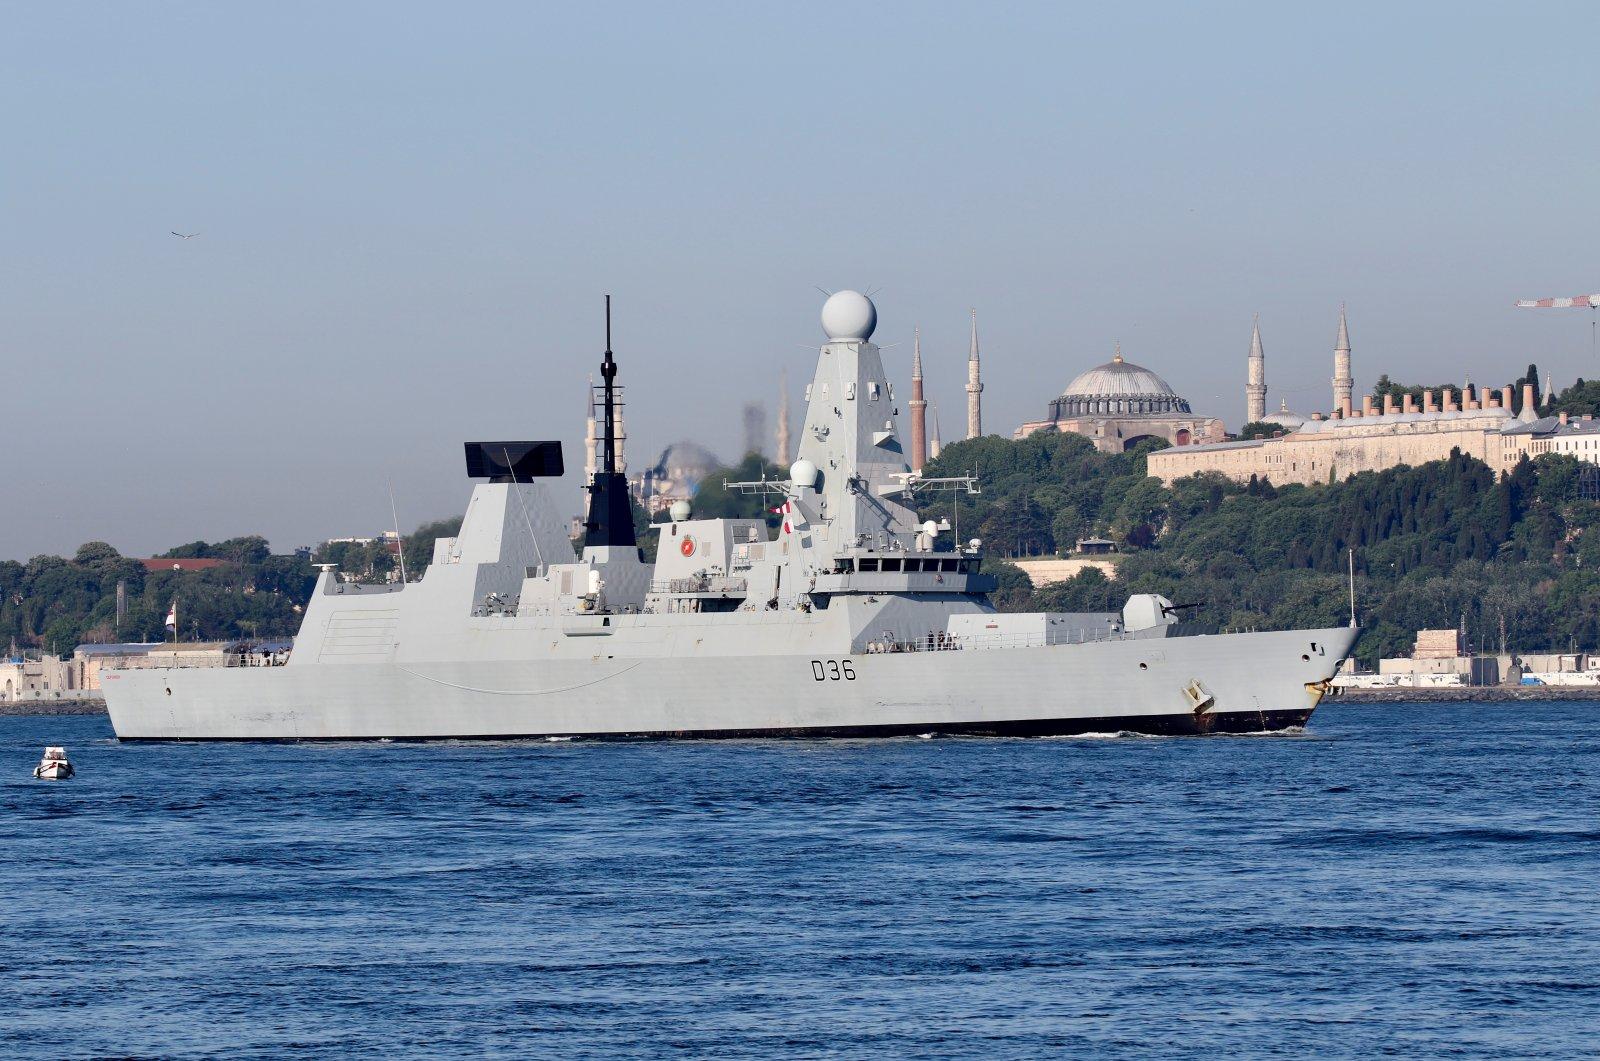 The British Royal Navy's Type 45 destroyer HMS Defender arrives for a port visit in Istanbul, Turkey, June 9, 2021. (Reuters Photo)